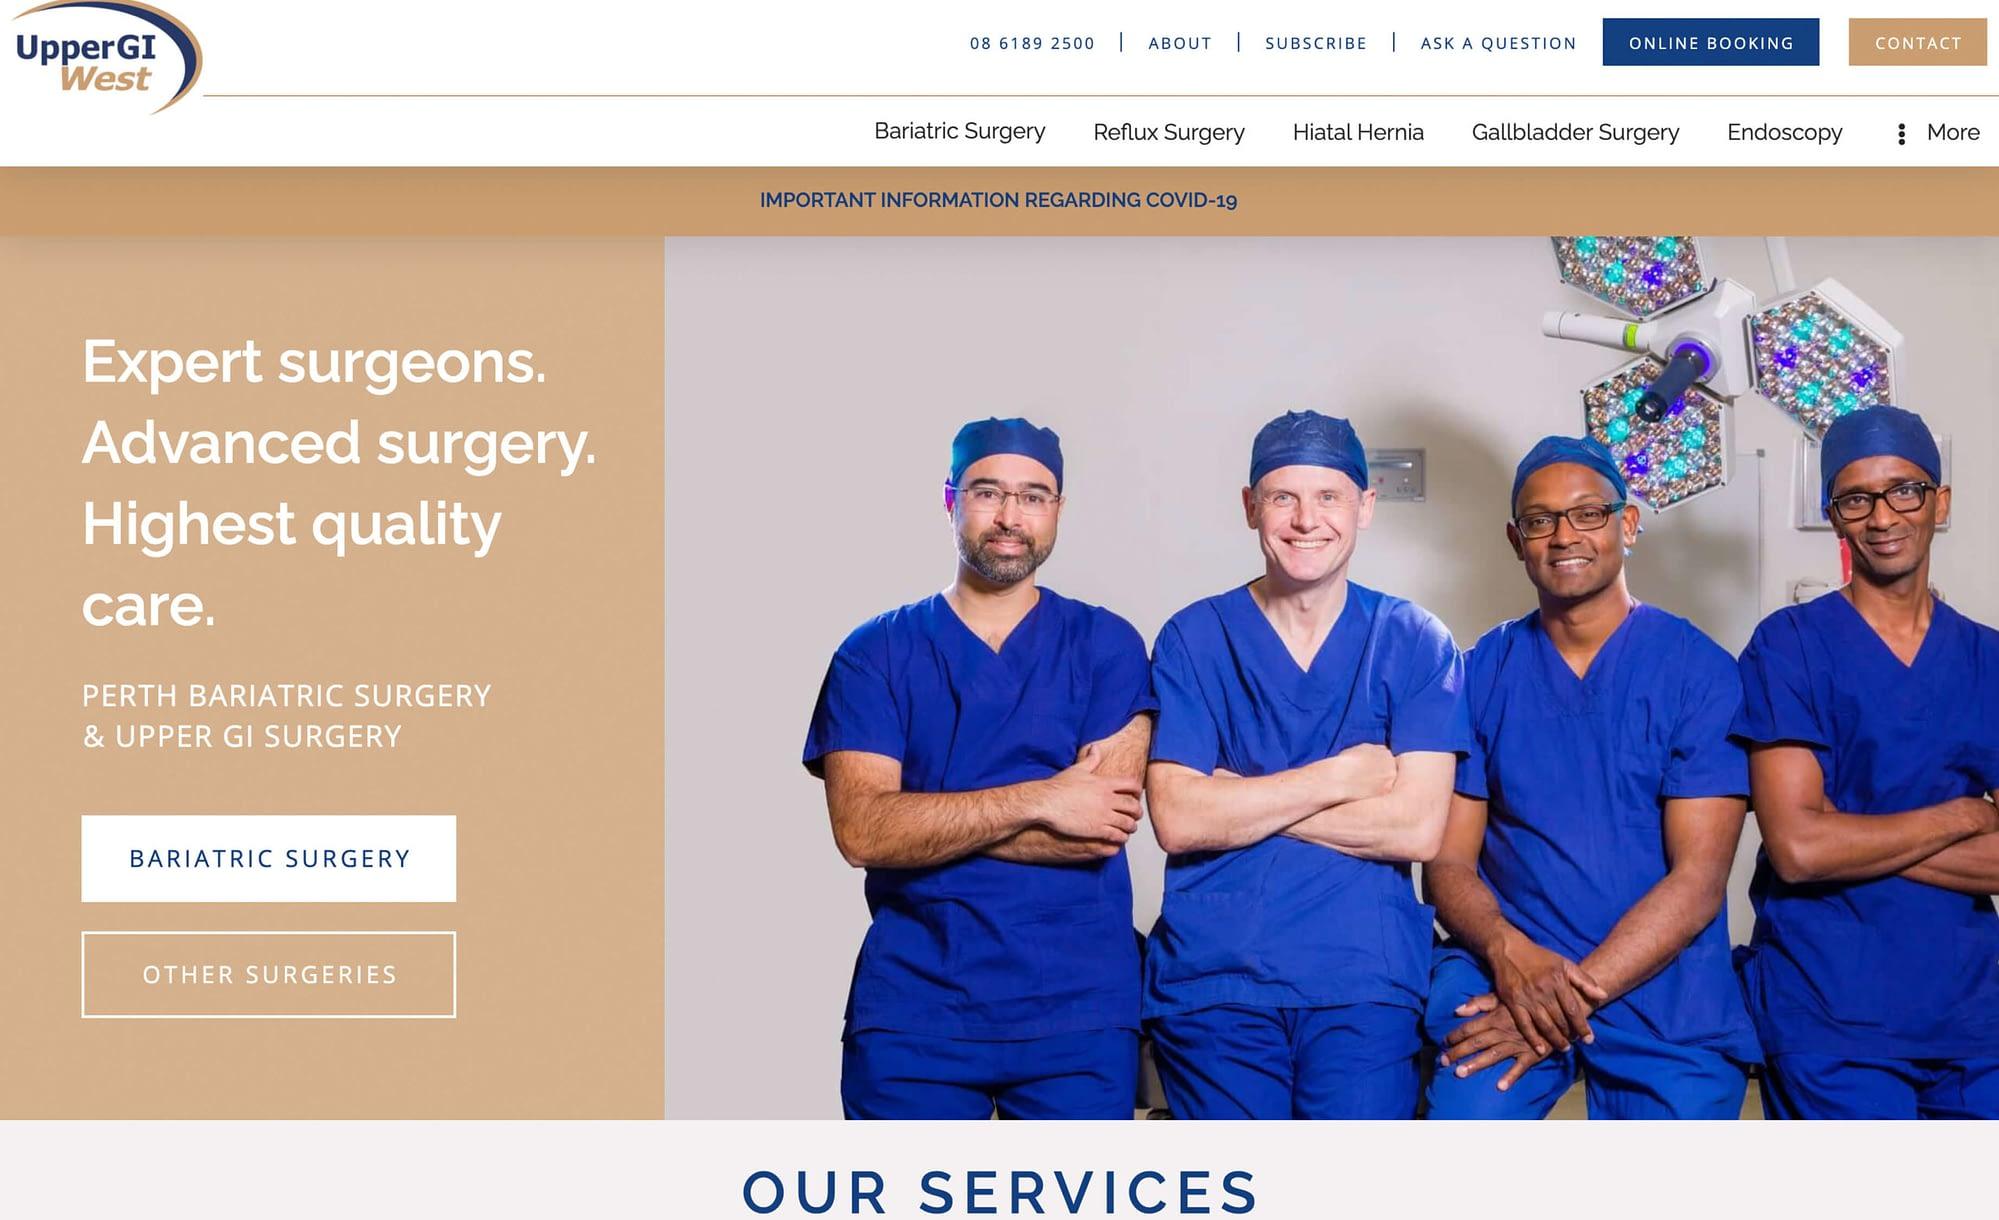 Upper GI West | Bariatric Surgery